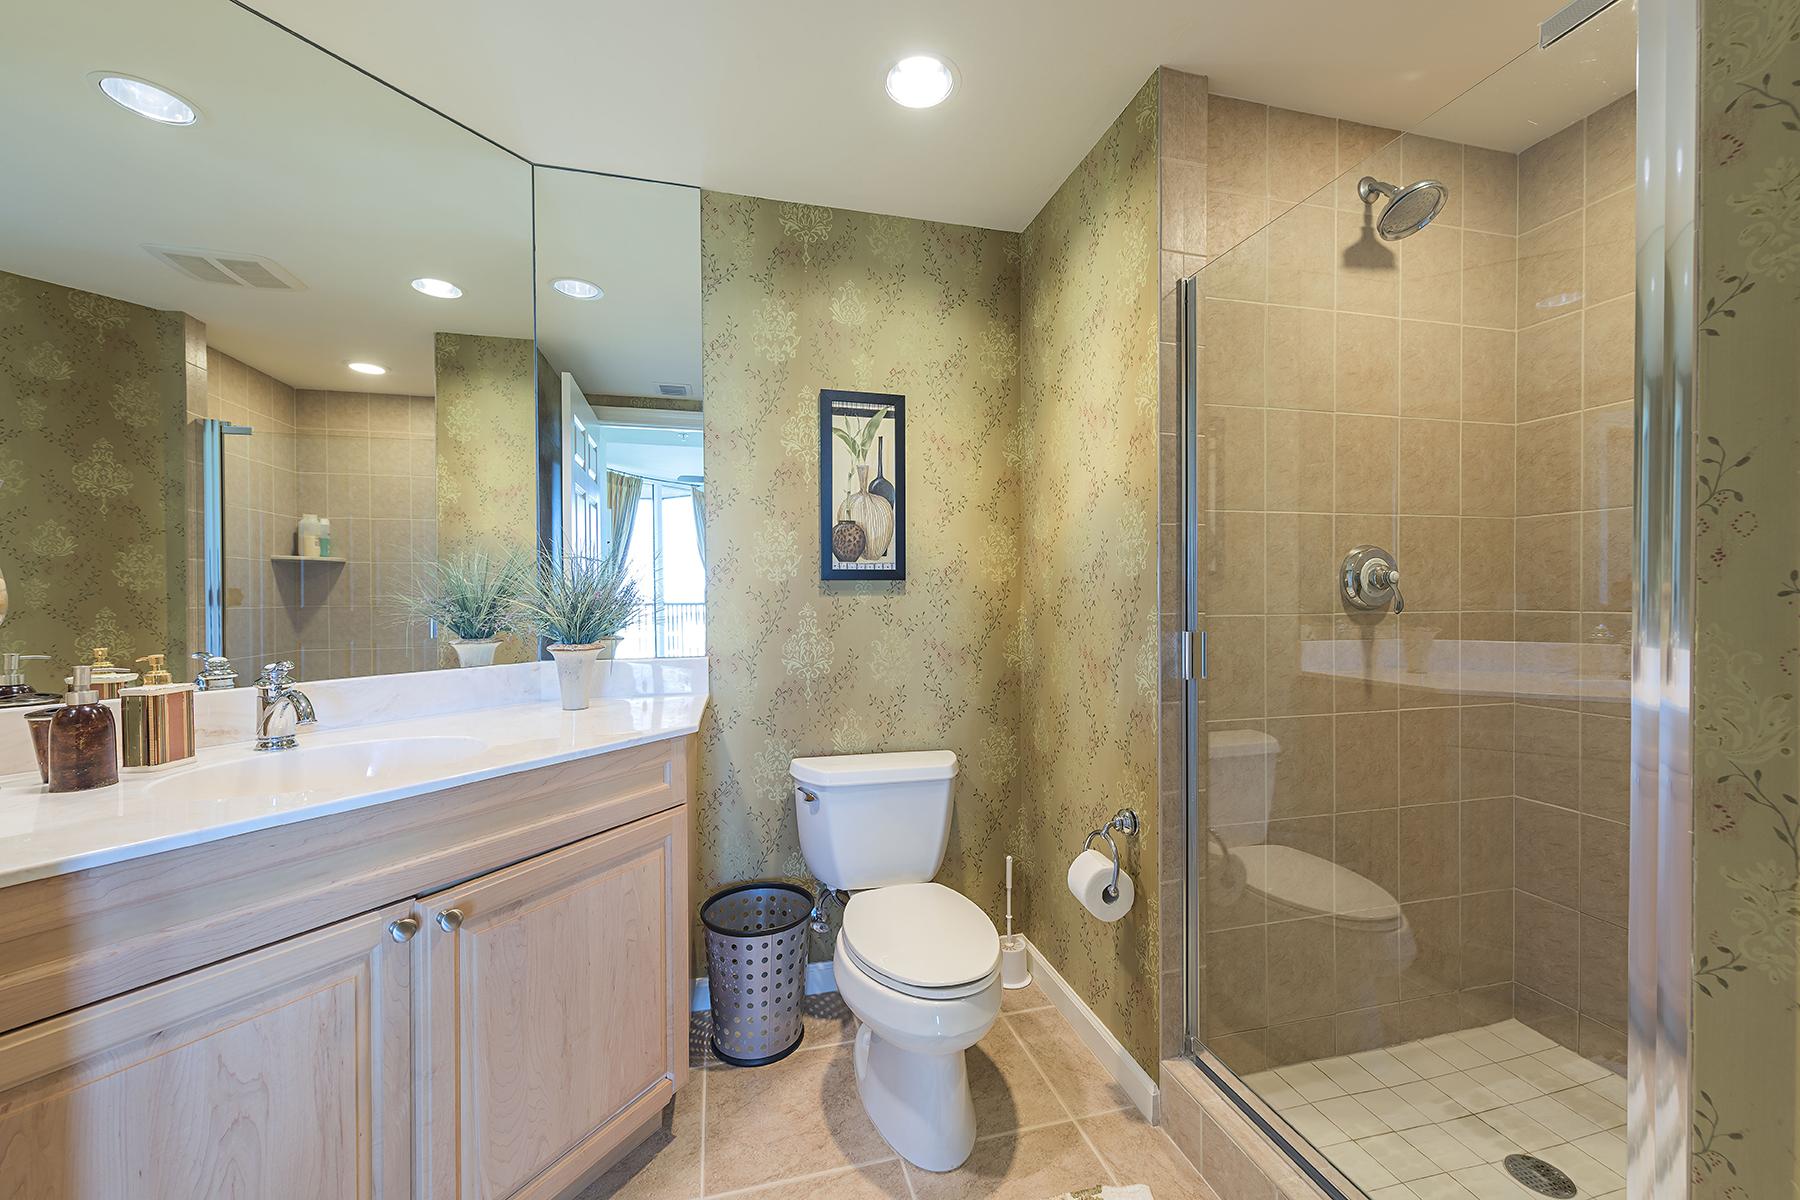 Additional photo for property listing at THE COLONY - PELICAN LANDING - NAVONA 23540  Via Veneto Blvd 704,  Bonita Springs, Florida 34134 United States